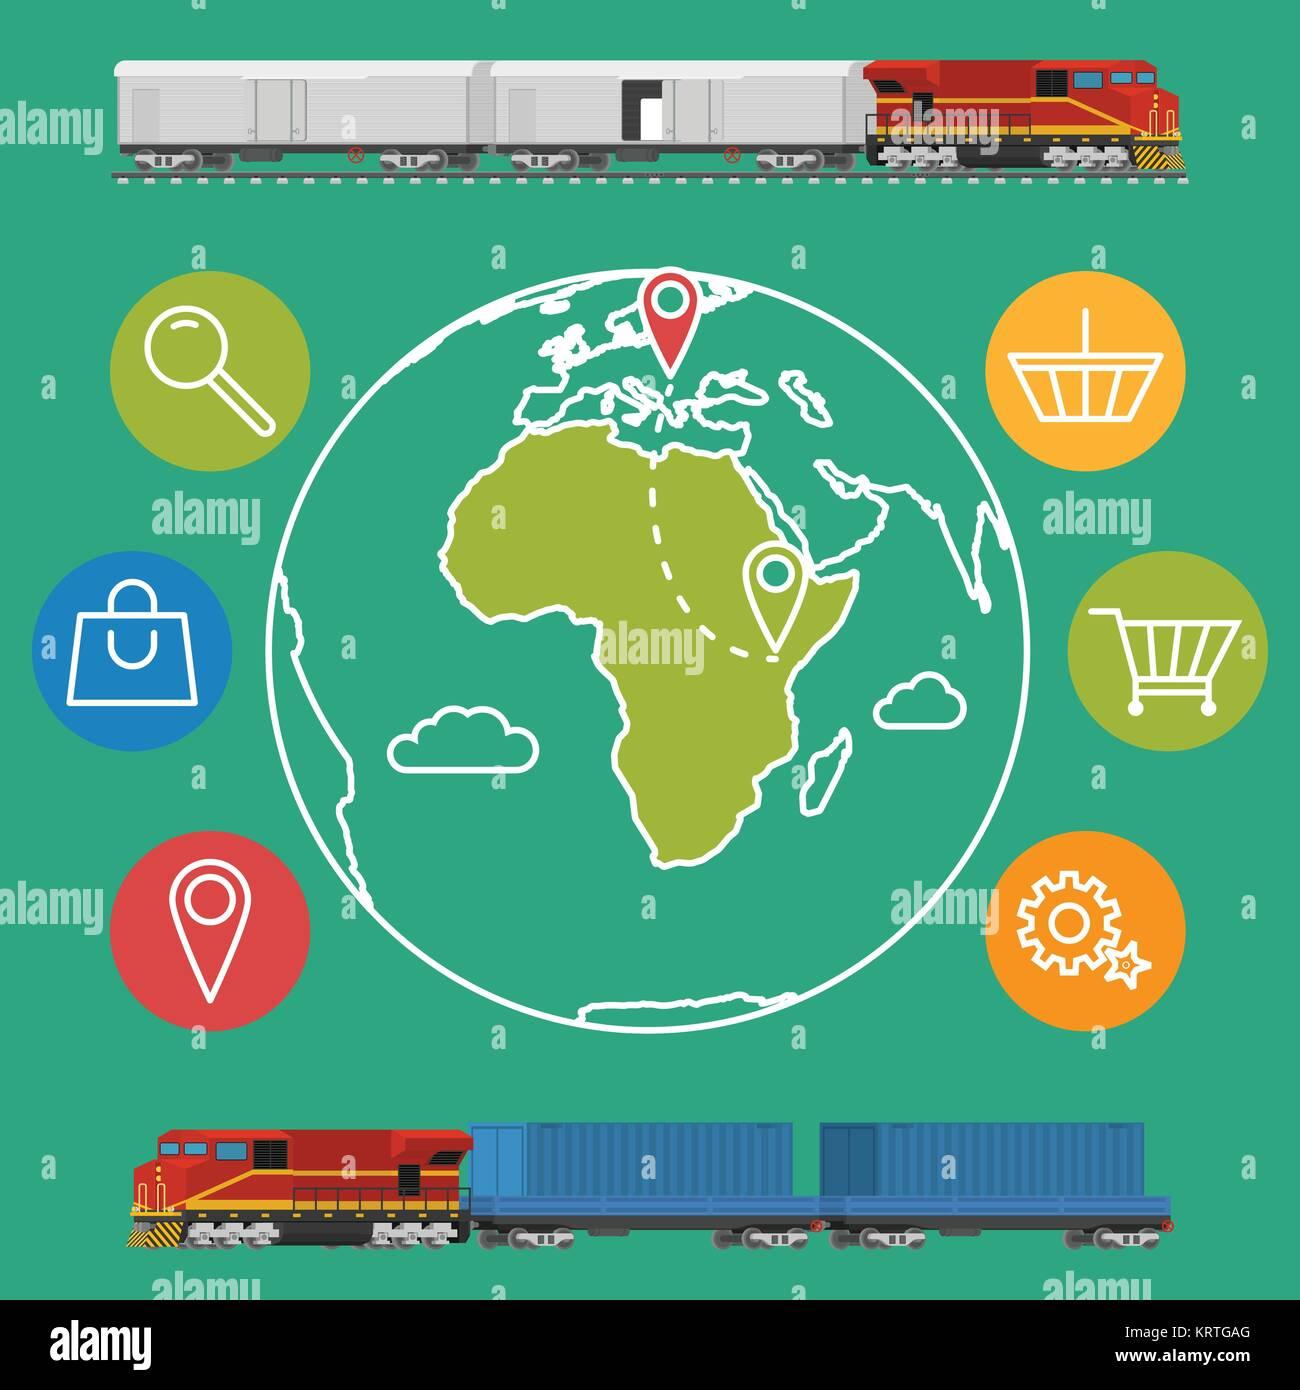 Container Flat Wagon Transport Rail Stock Photos